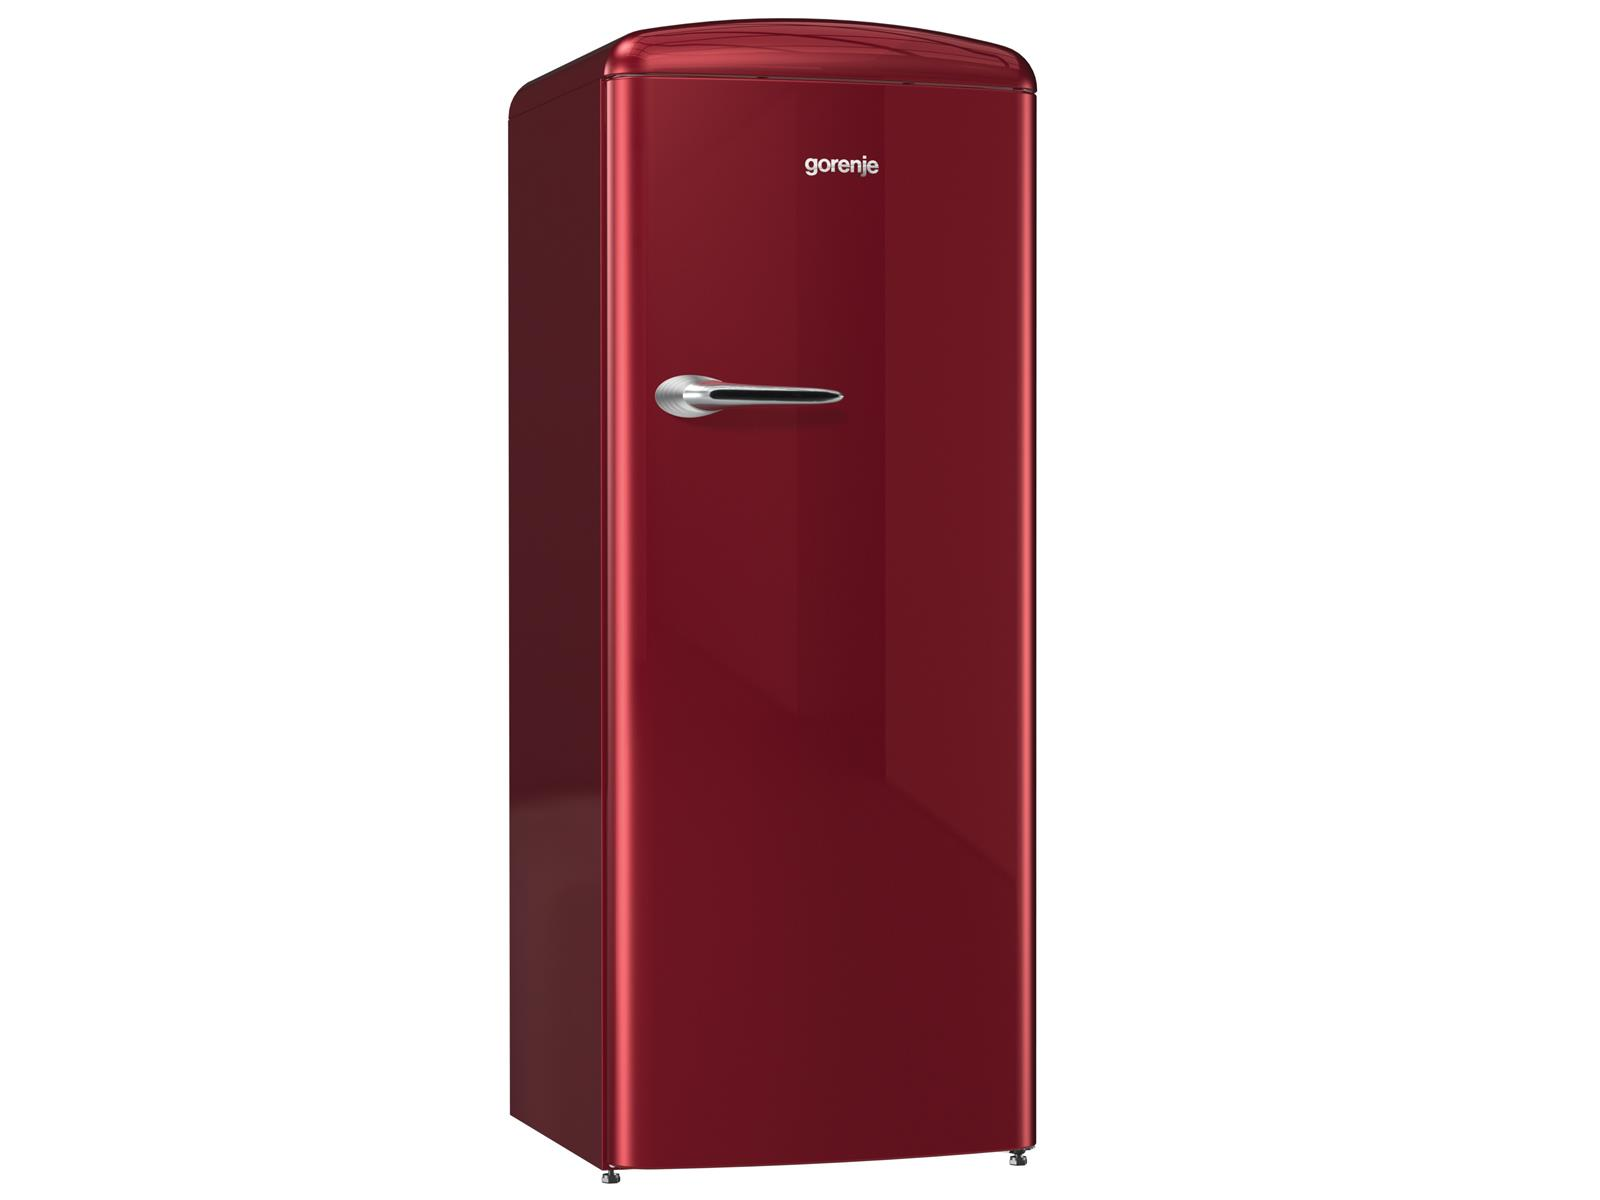 Gorenje Kühlschrank Orb153r : Gorenje orb r standkühlschrank burgundy